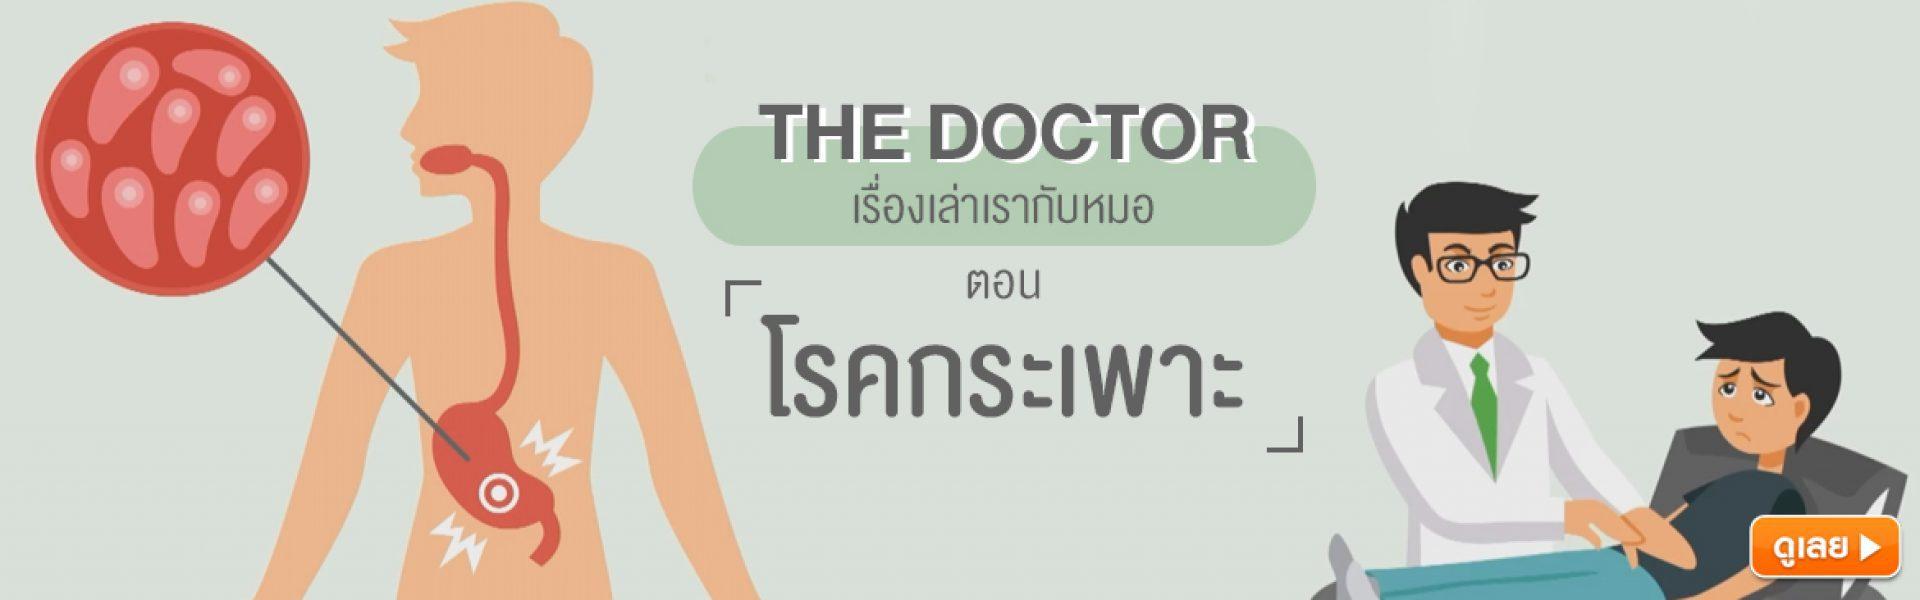 The Doctor เรื่องเล่าเรากับหมอ ตอน โรคกระเพาะ